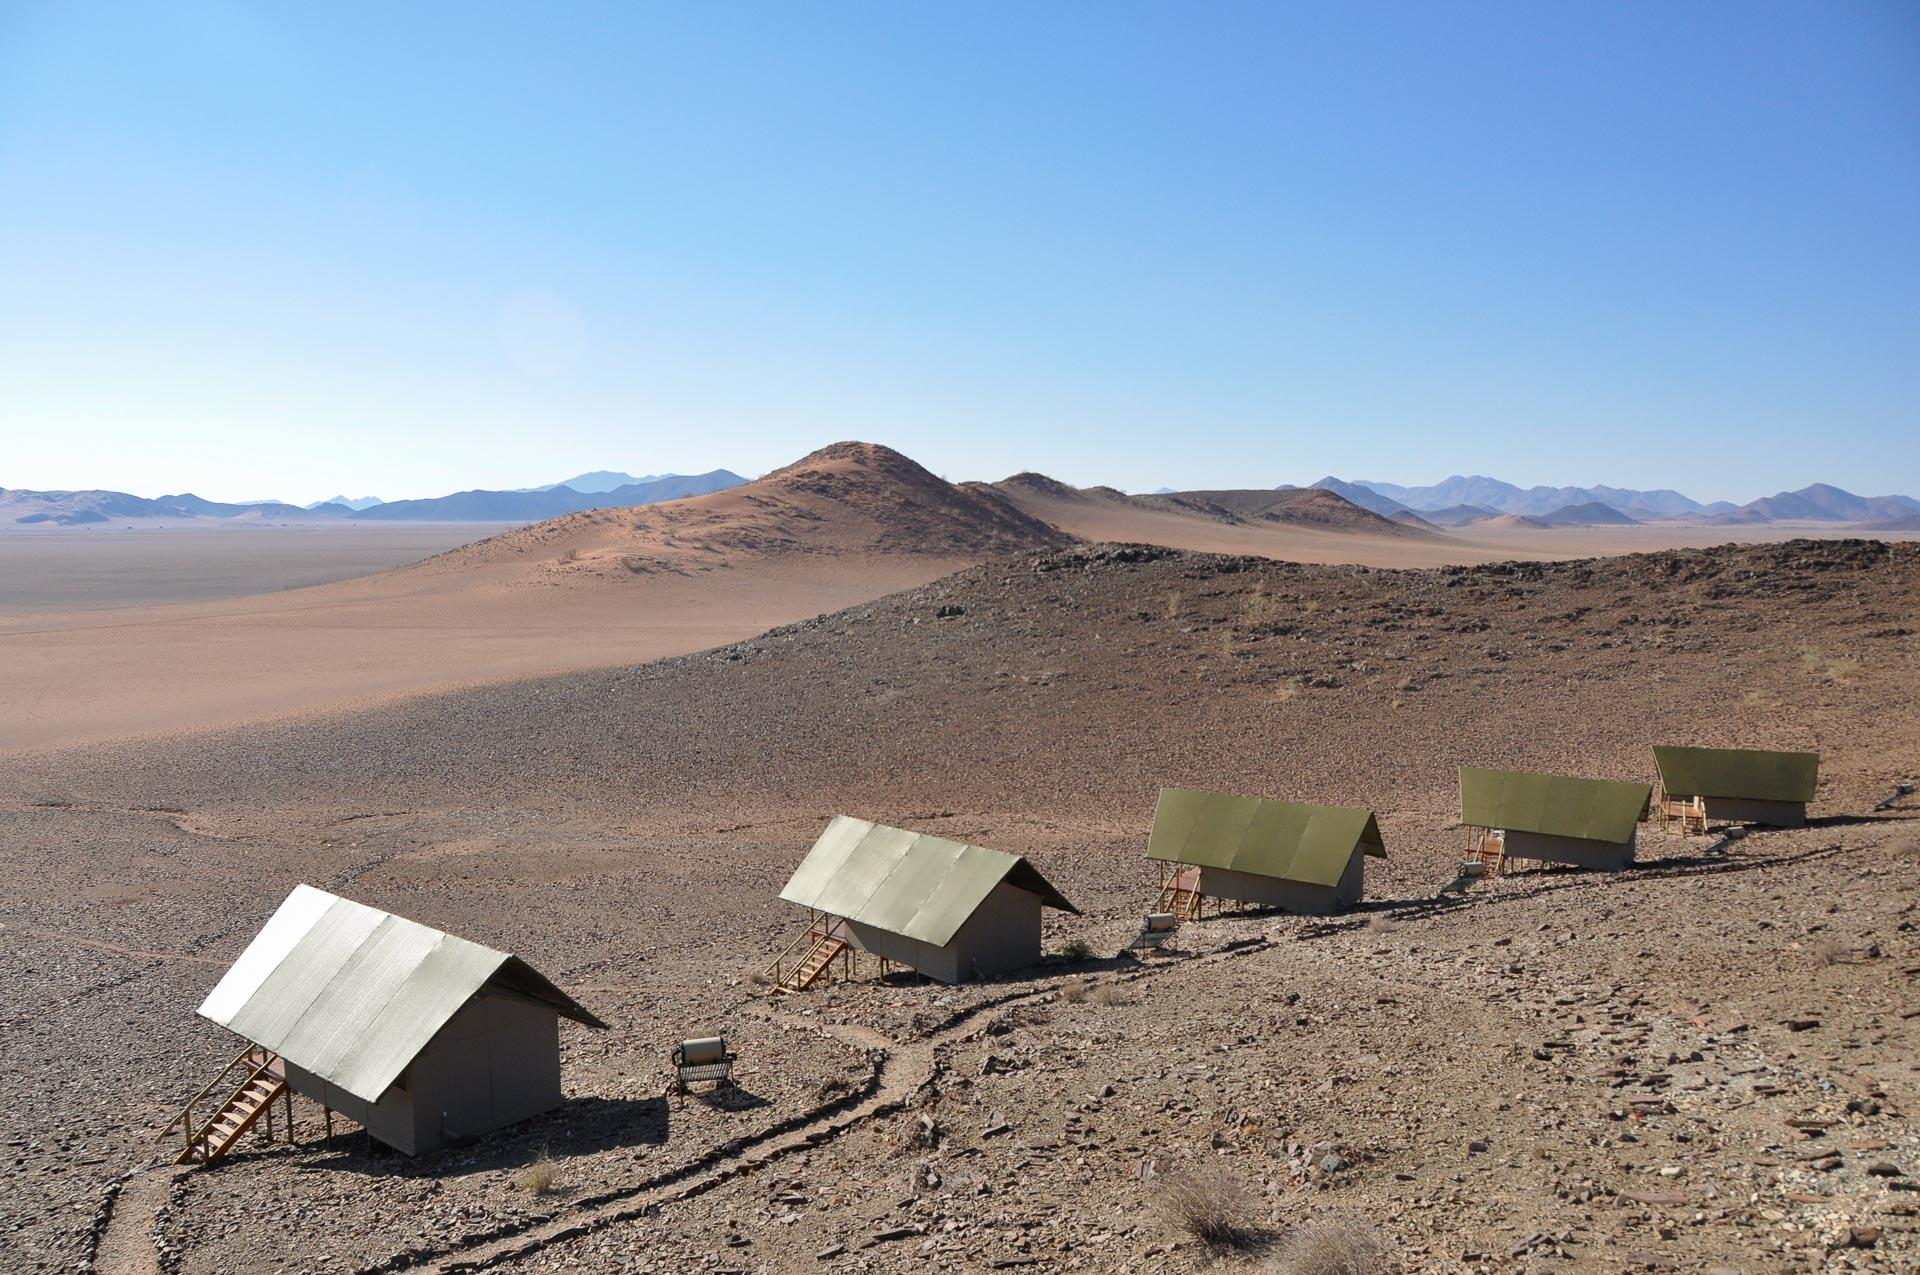 Kanaan-Desert-Retreat-Namibia-Globetrotter-Select-10